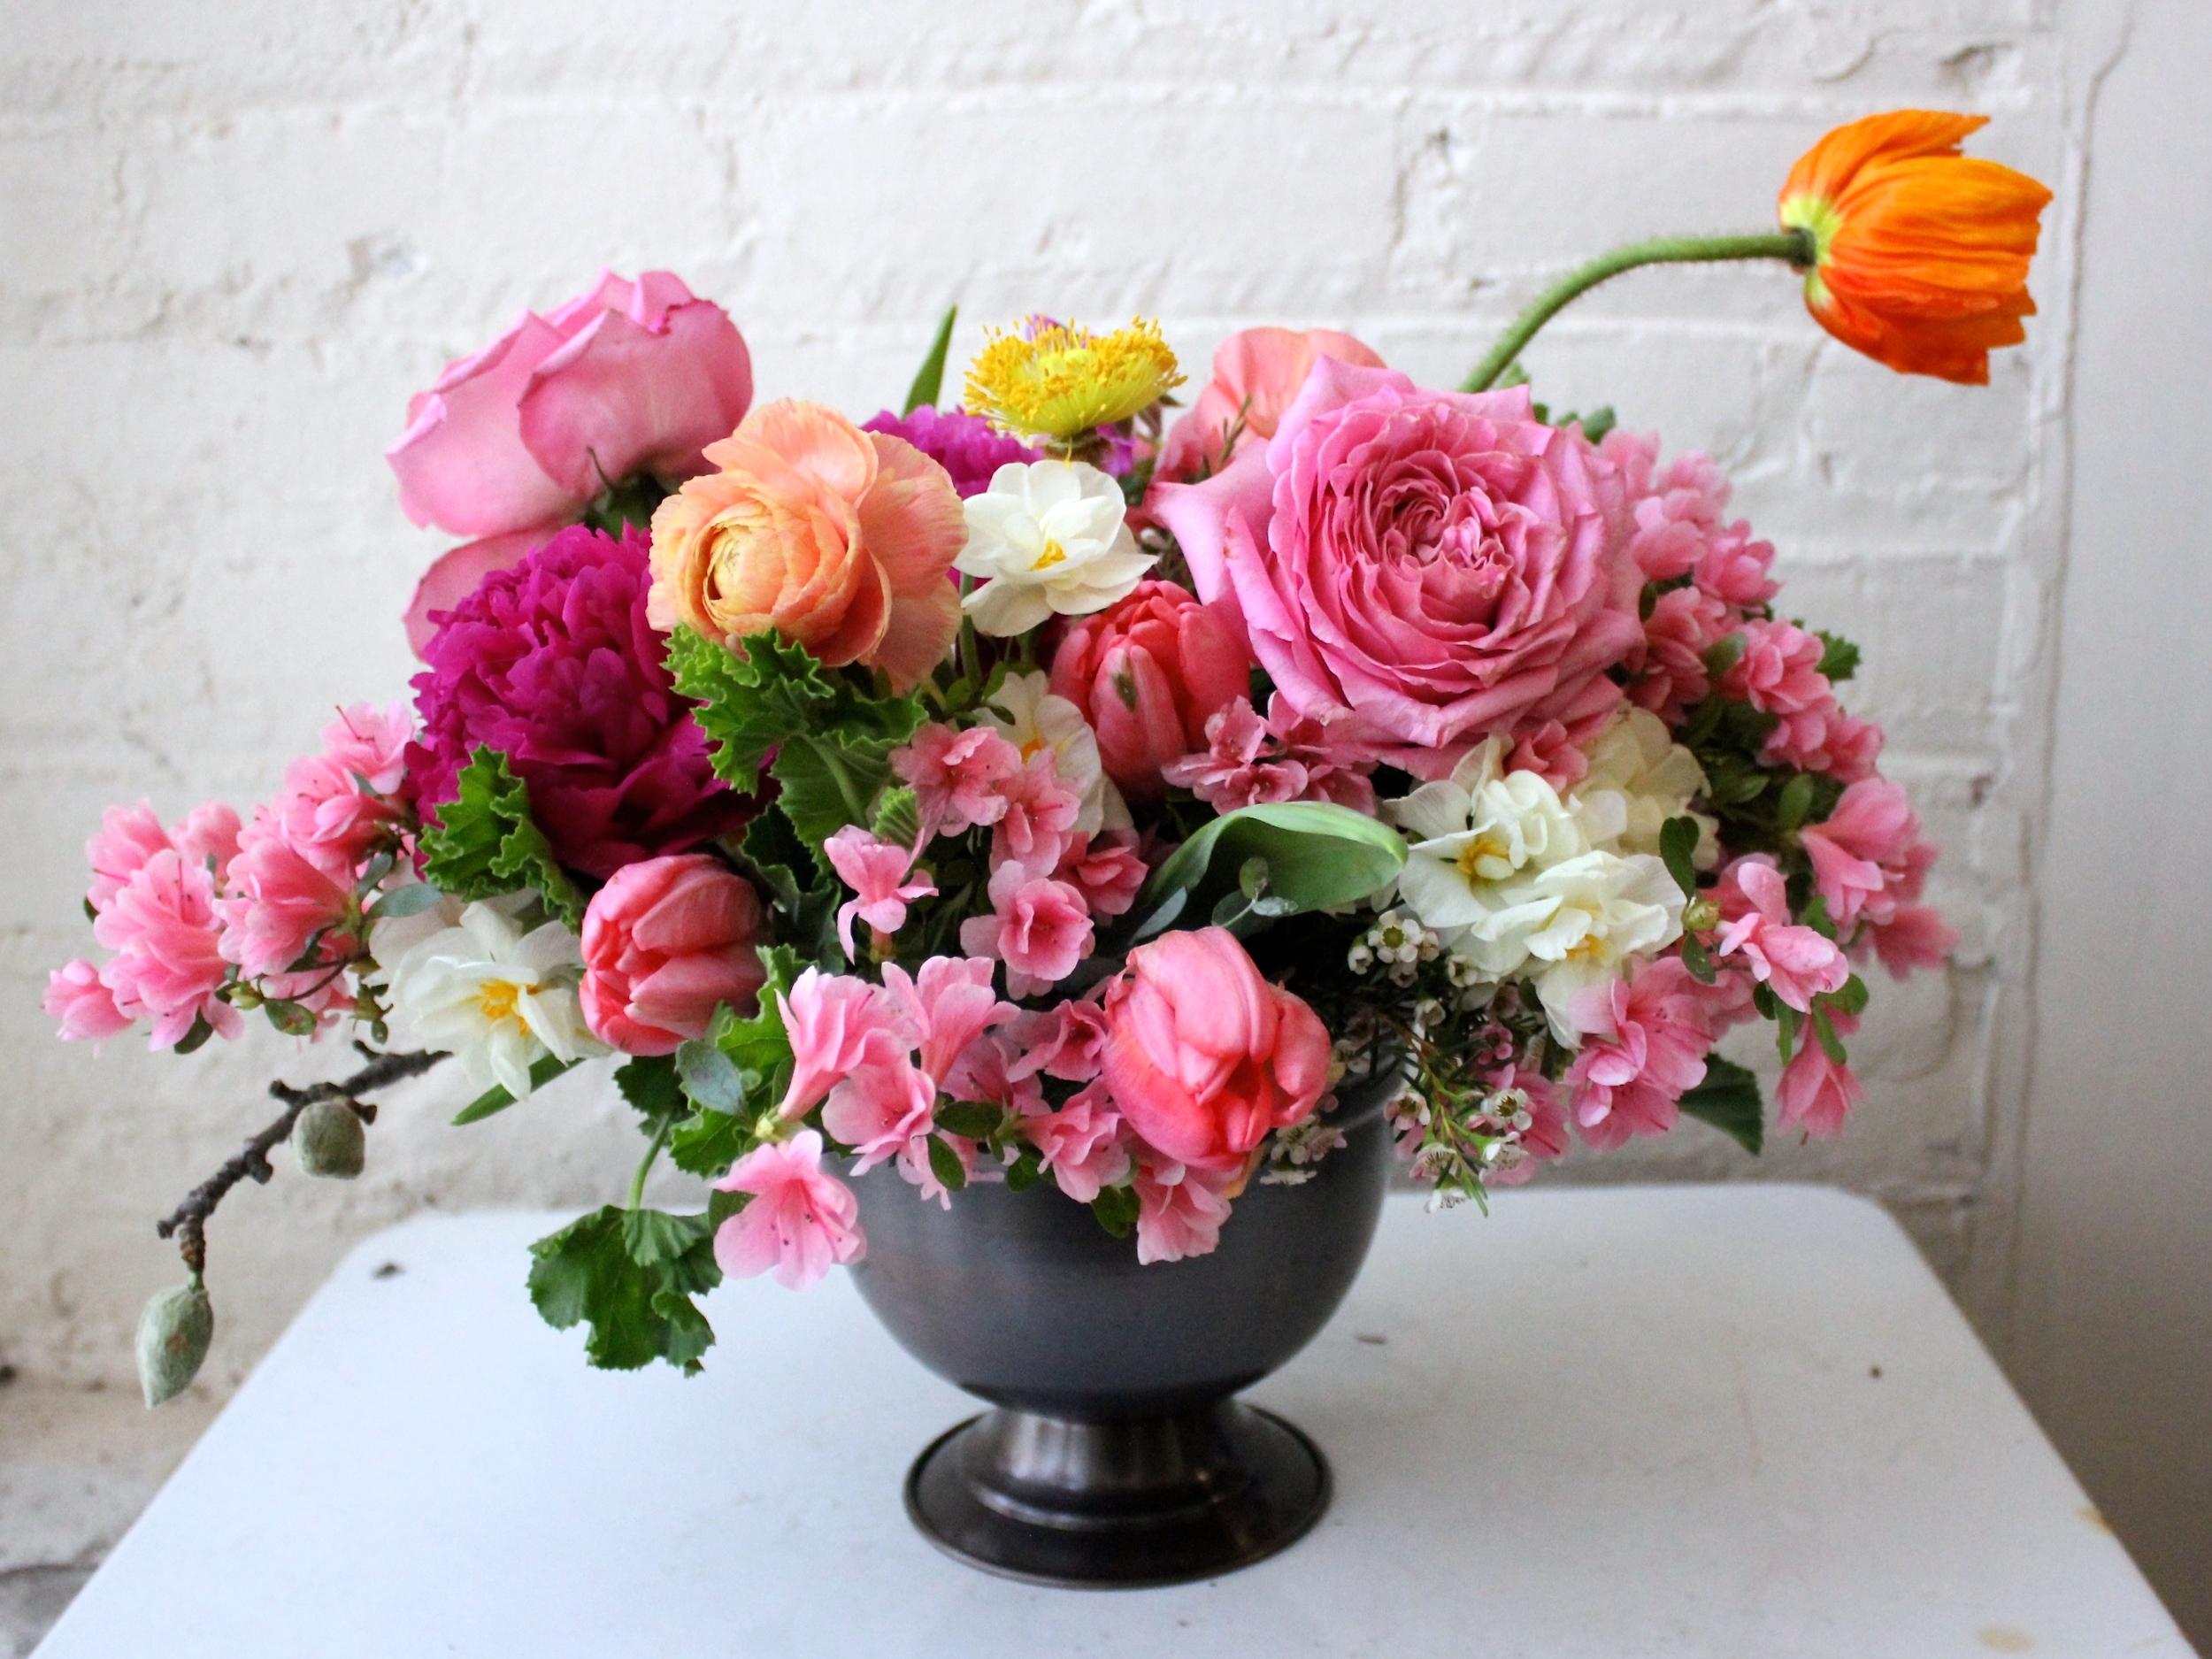 Floral Arrangements Sachi Rose Floral Design